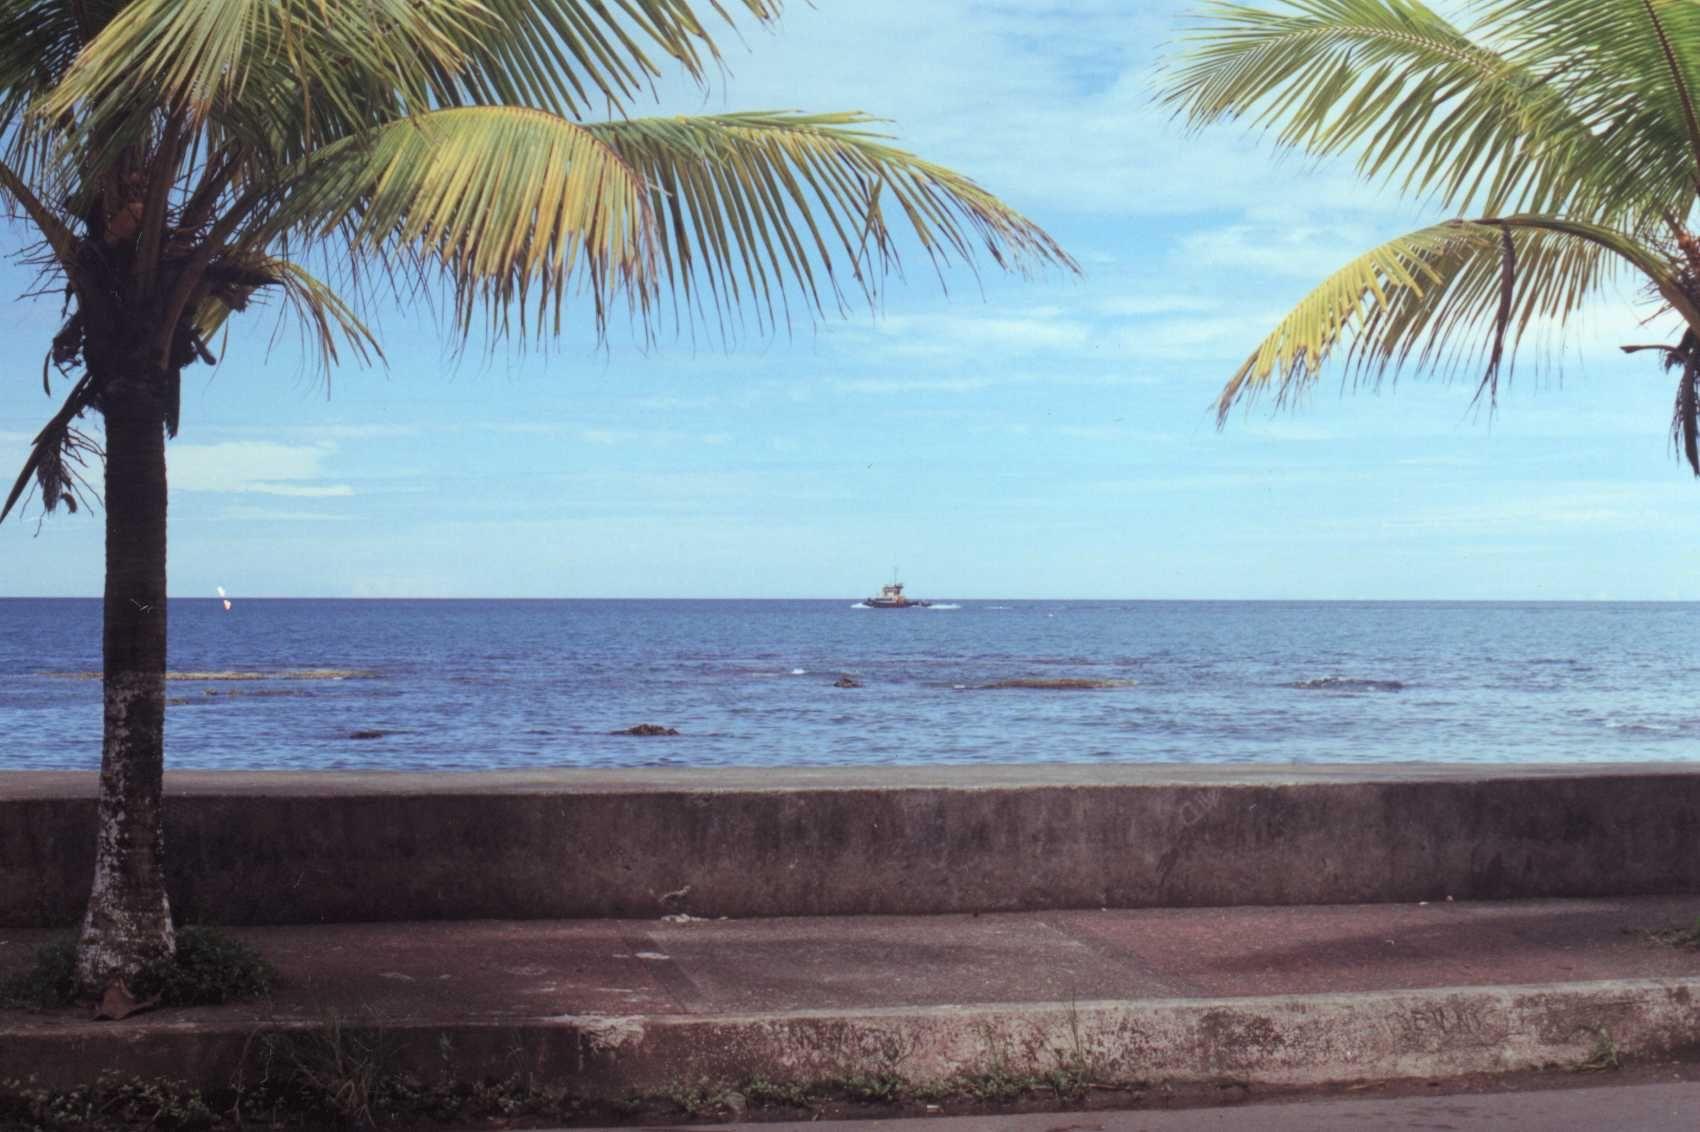 Tajamar. Puerto Limon, Costa Rica | Puerto limon, Limon costa rica, Costa